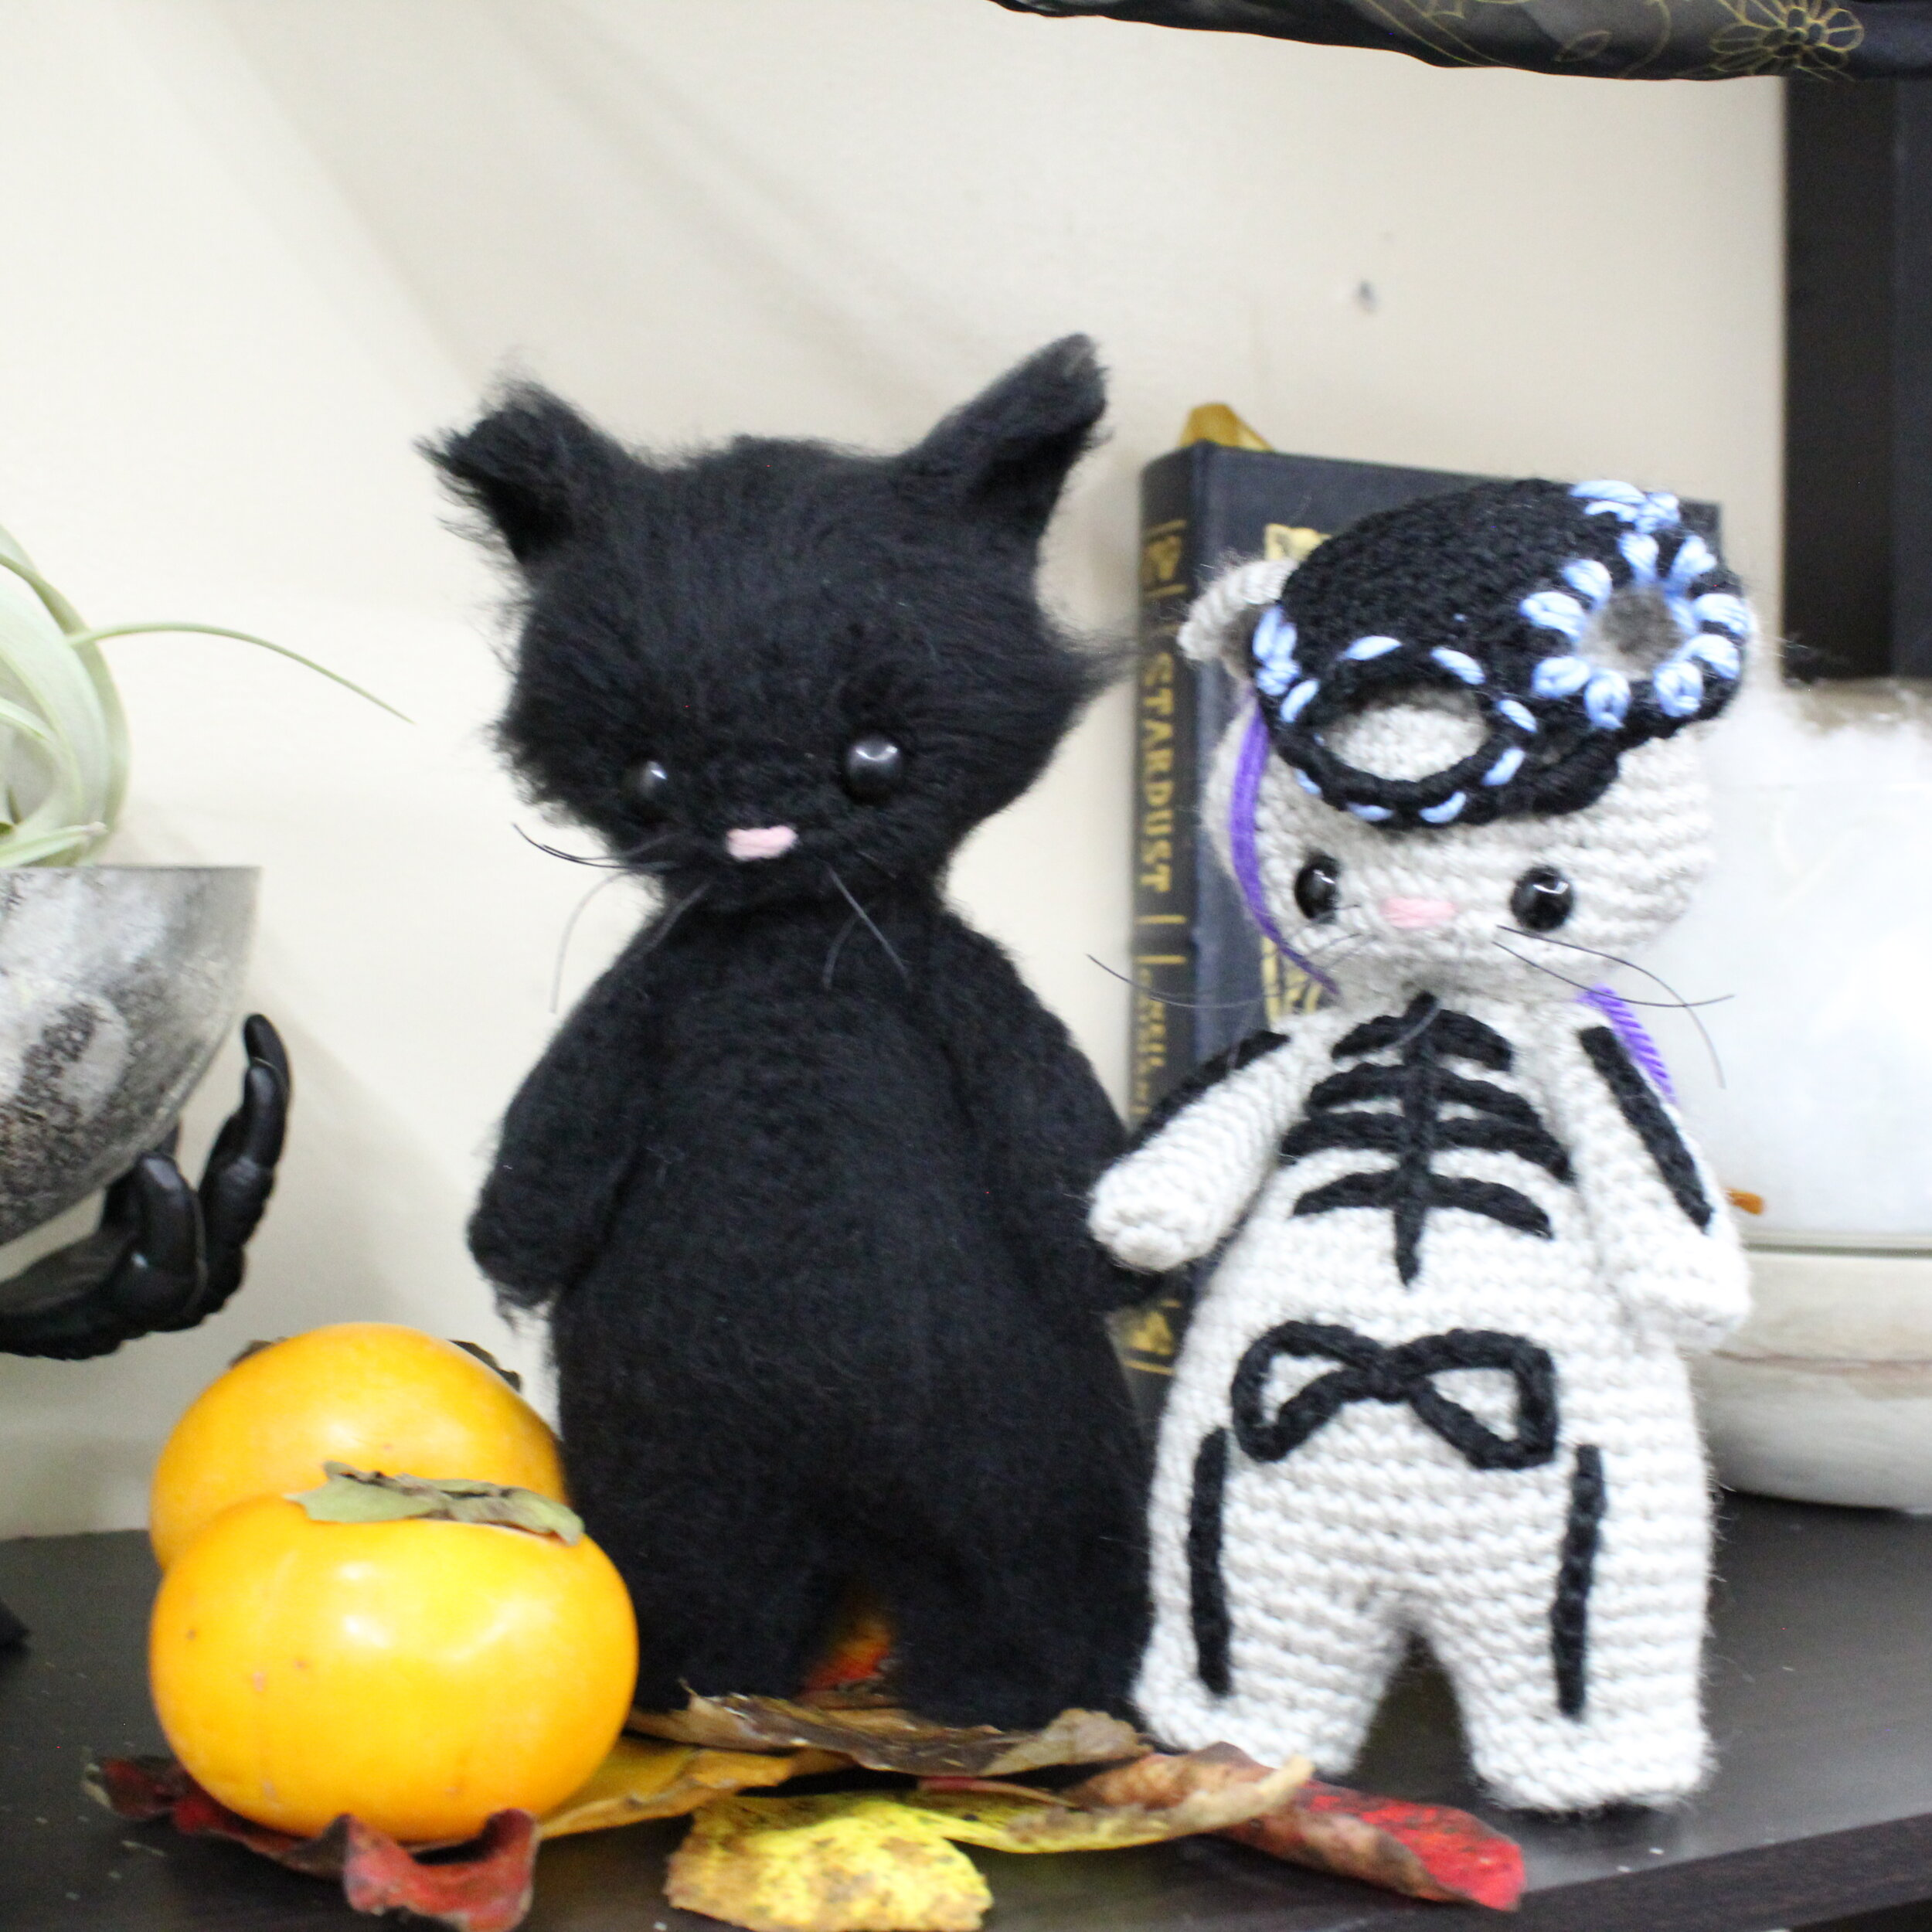 Jiji the Black cat | Plush pattern, Black cat plush, Amigurumi ... | 1000x1000